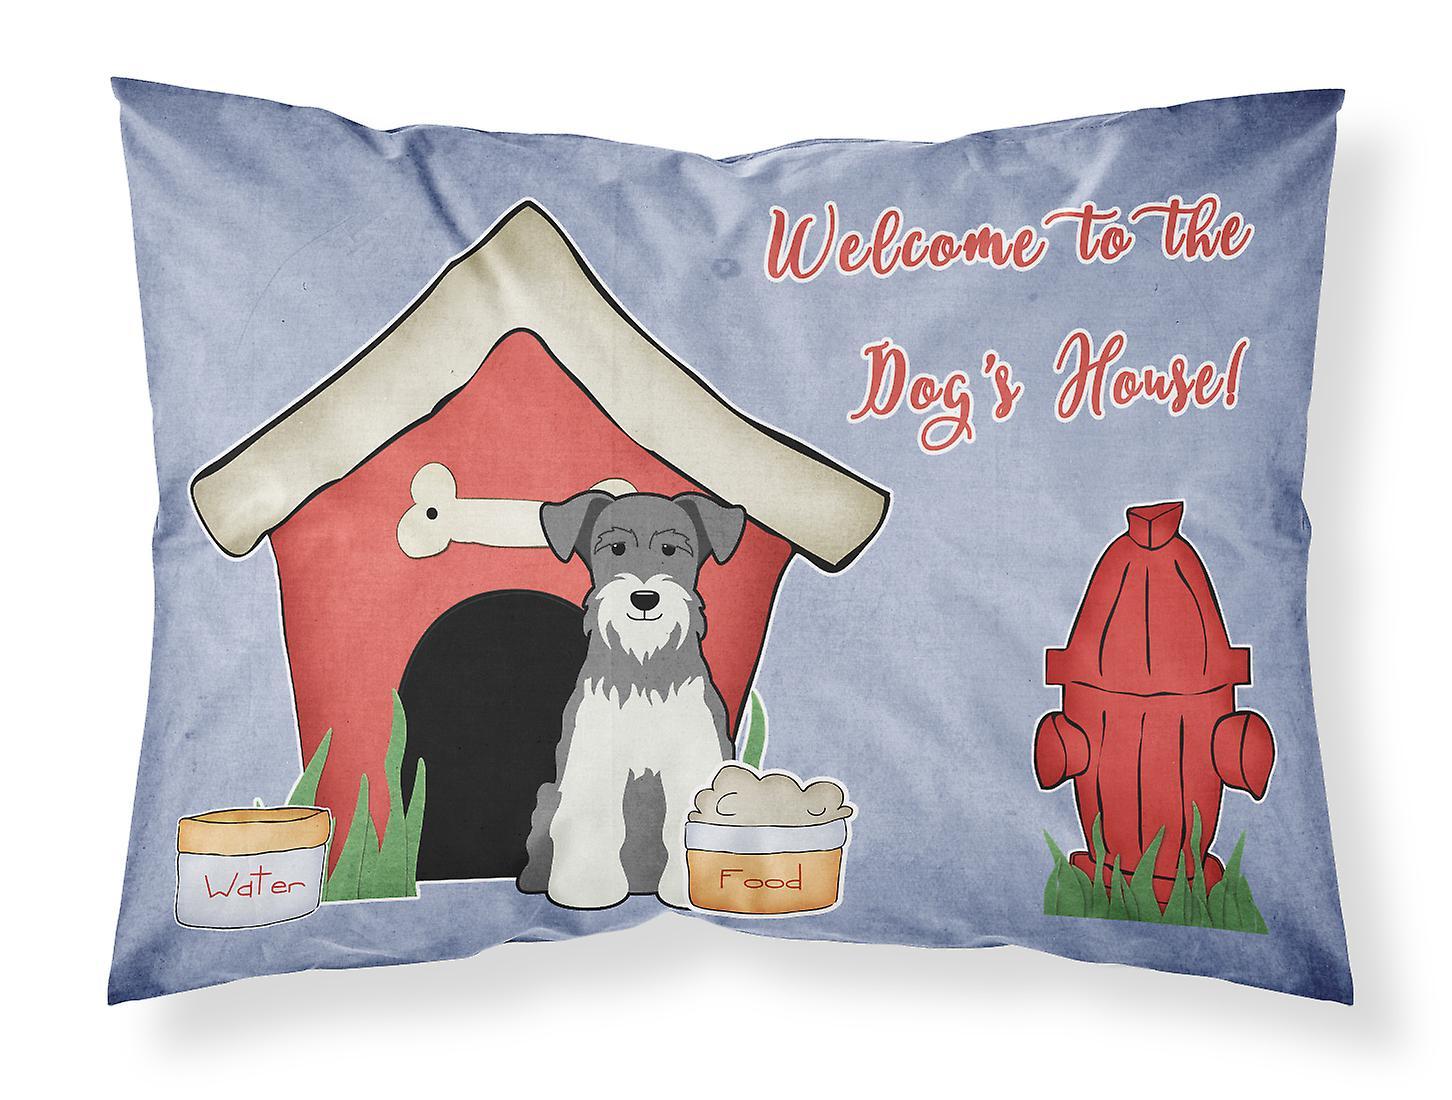 Dog Et Miniature Pillowc Standard Sel House Collection Tissu Poivre Schanuzer NOkZwX0nP8